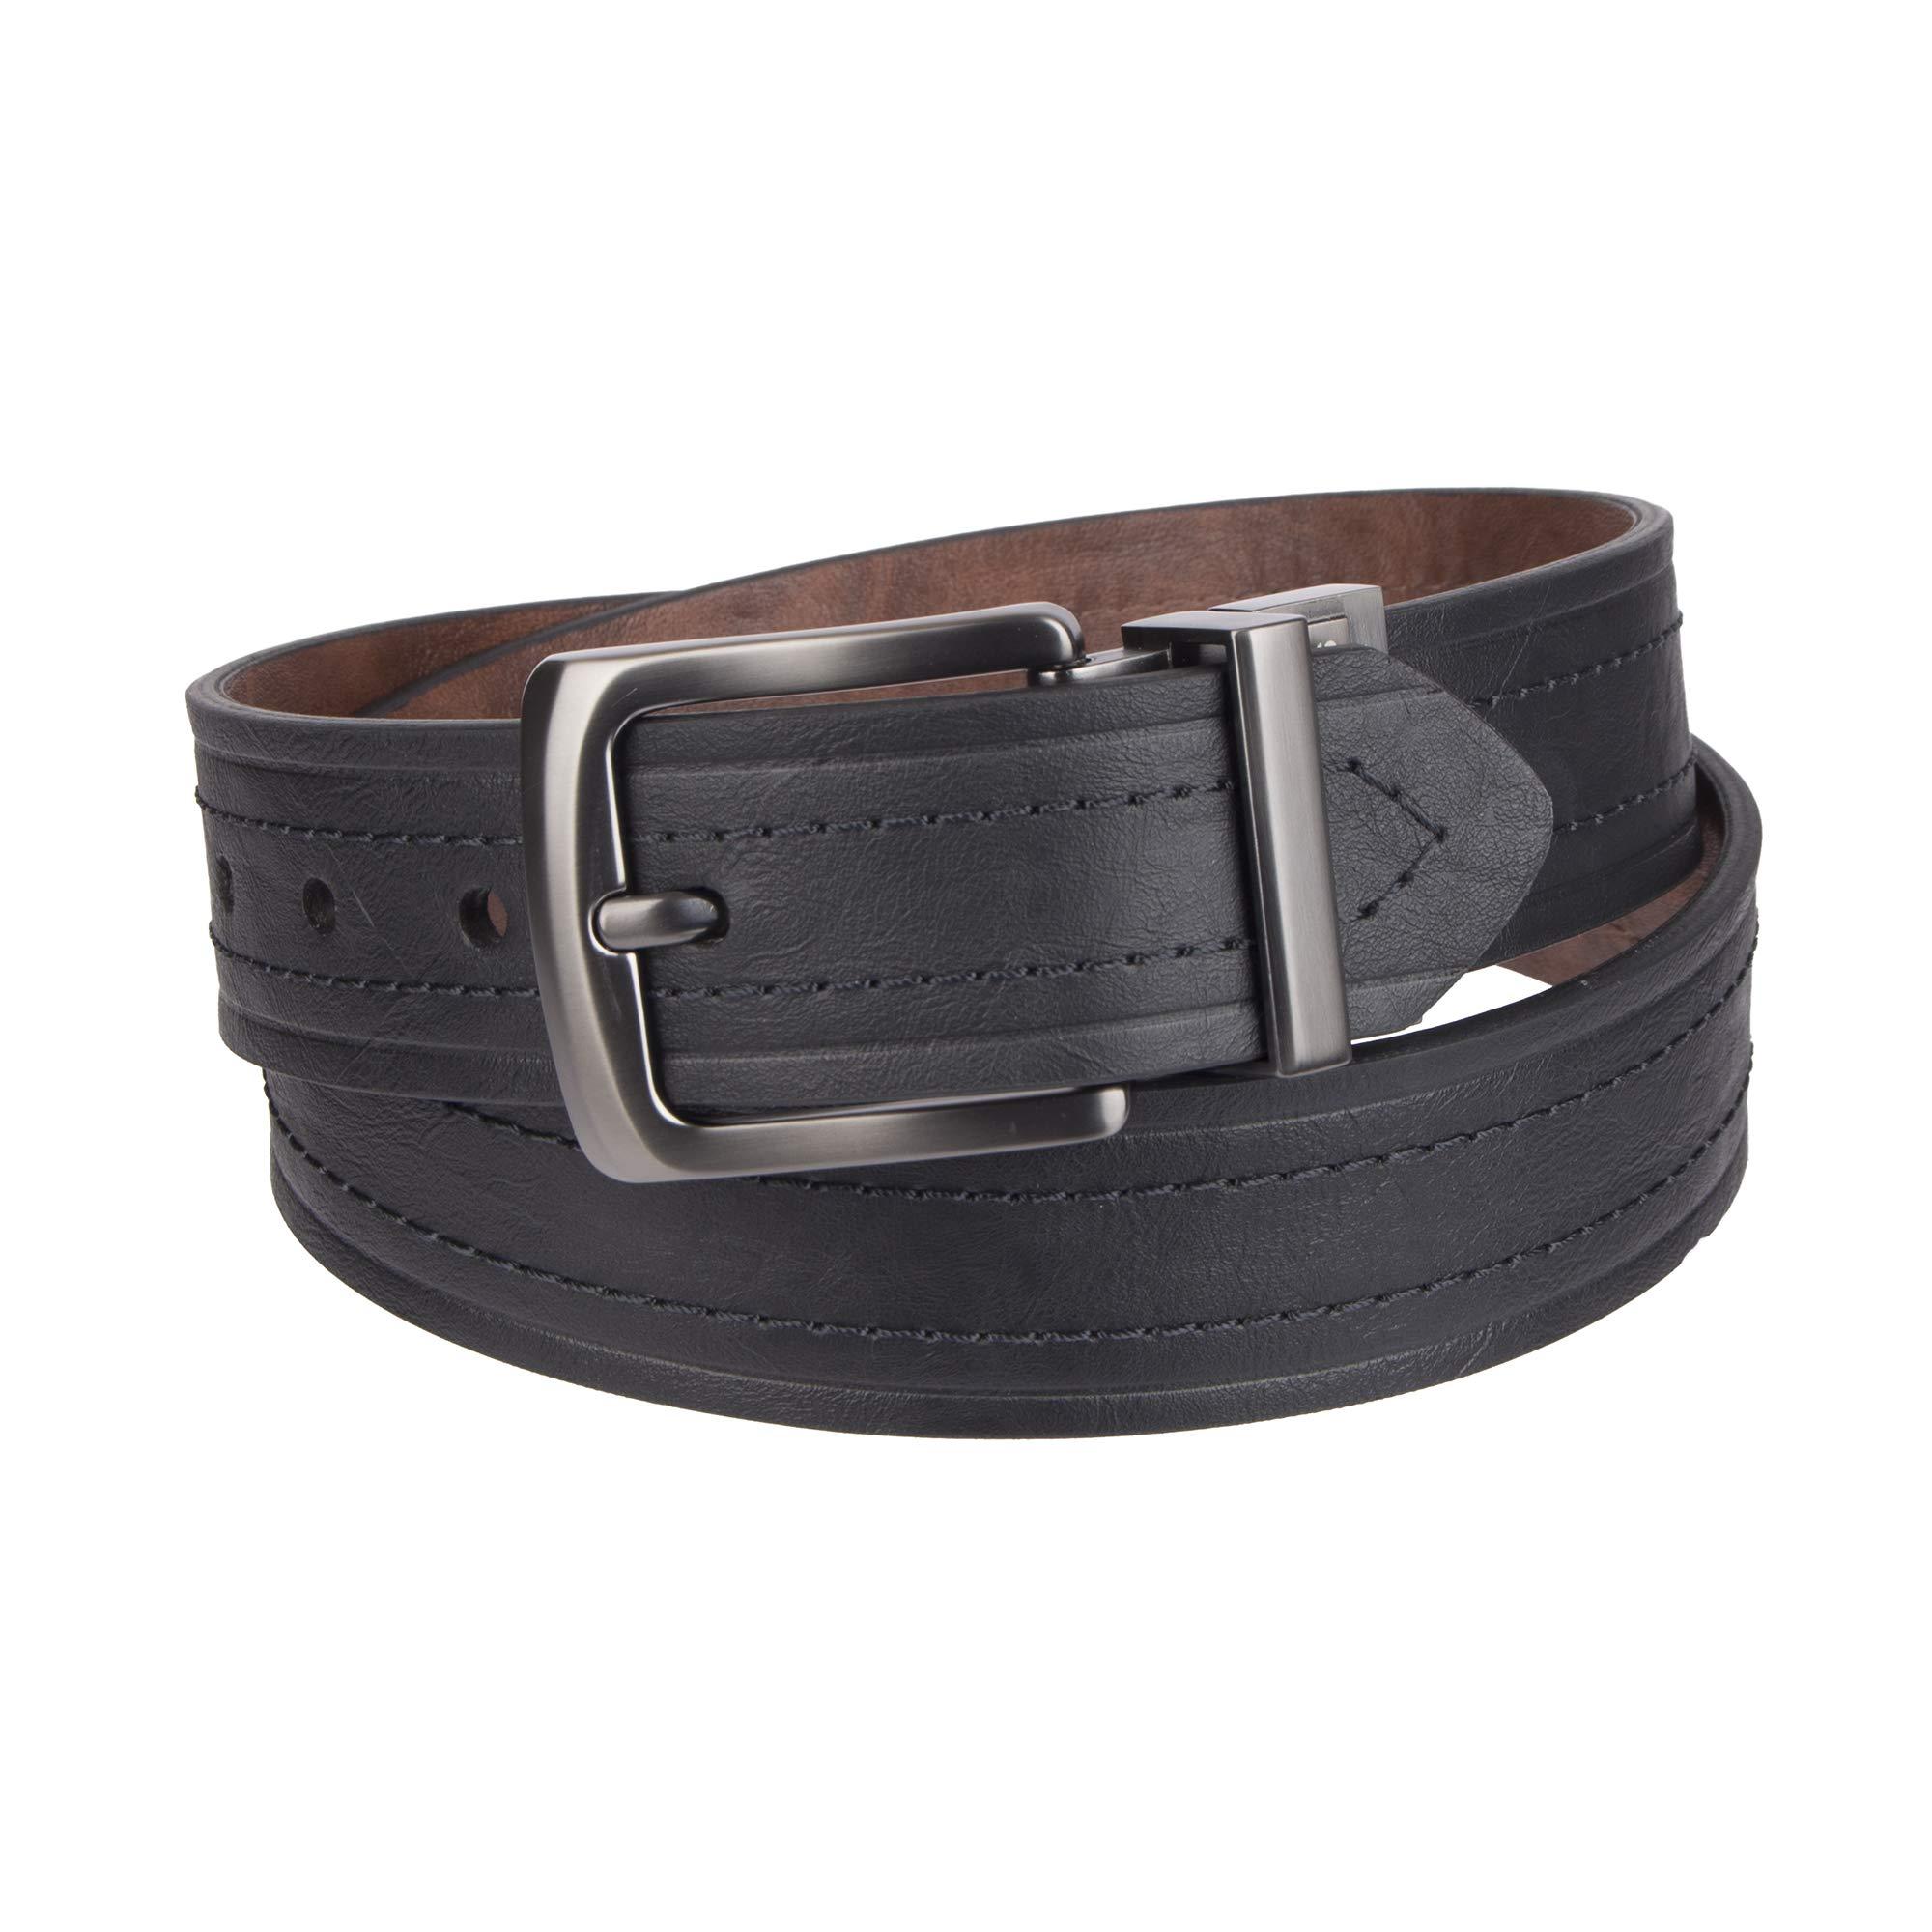 Levi's Men's 1 9/16 in. Reversible Belt-Black/Tan, 36 by Levi's